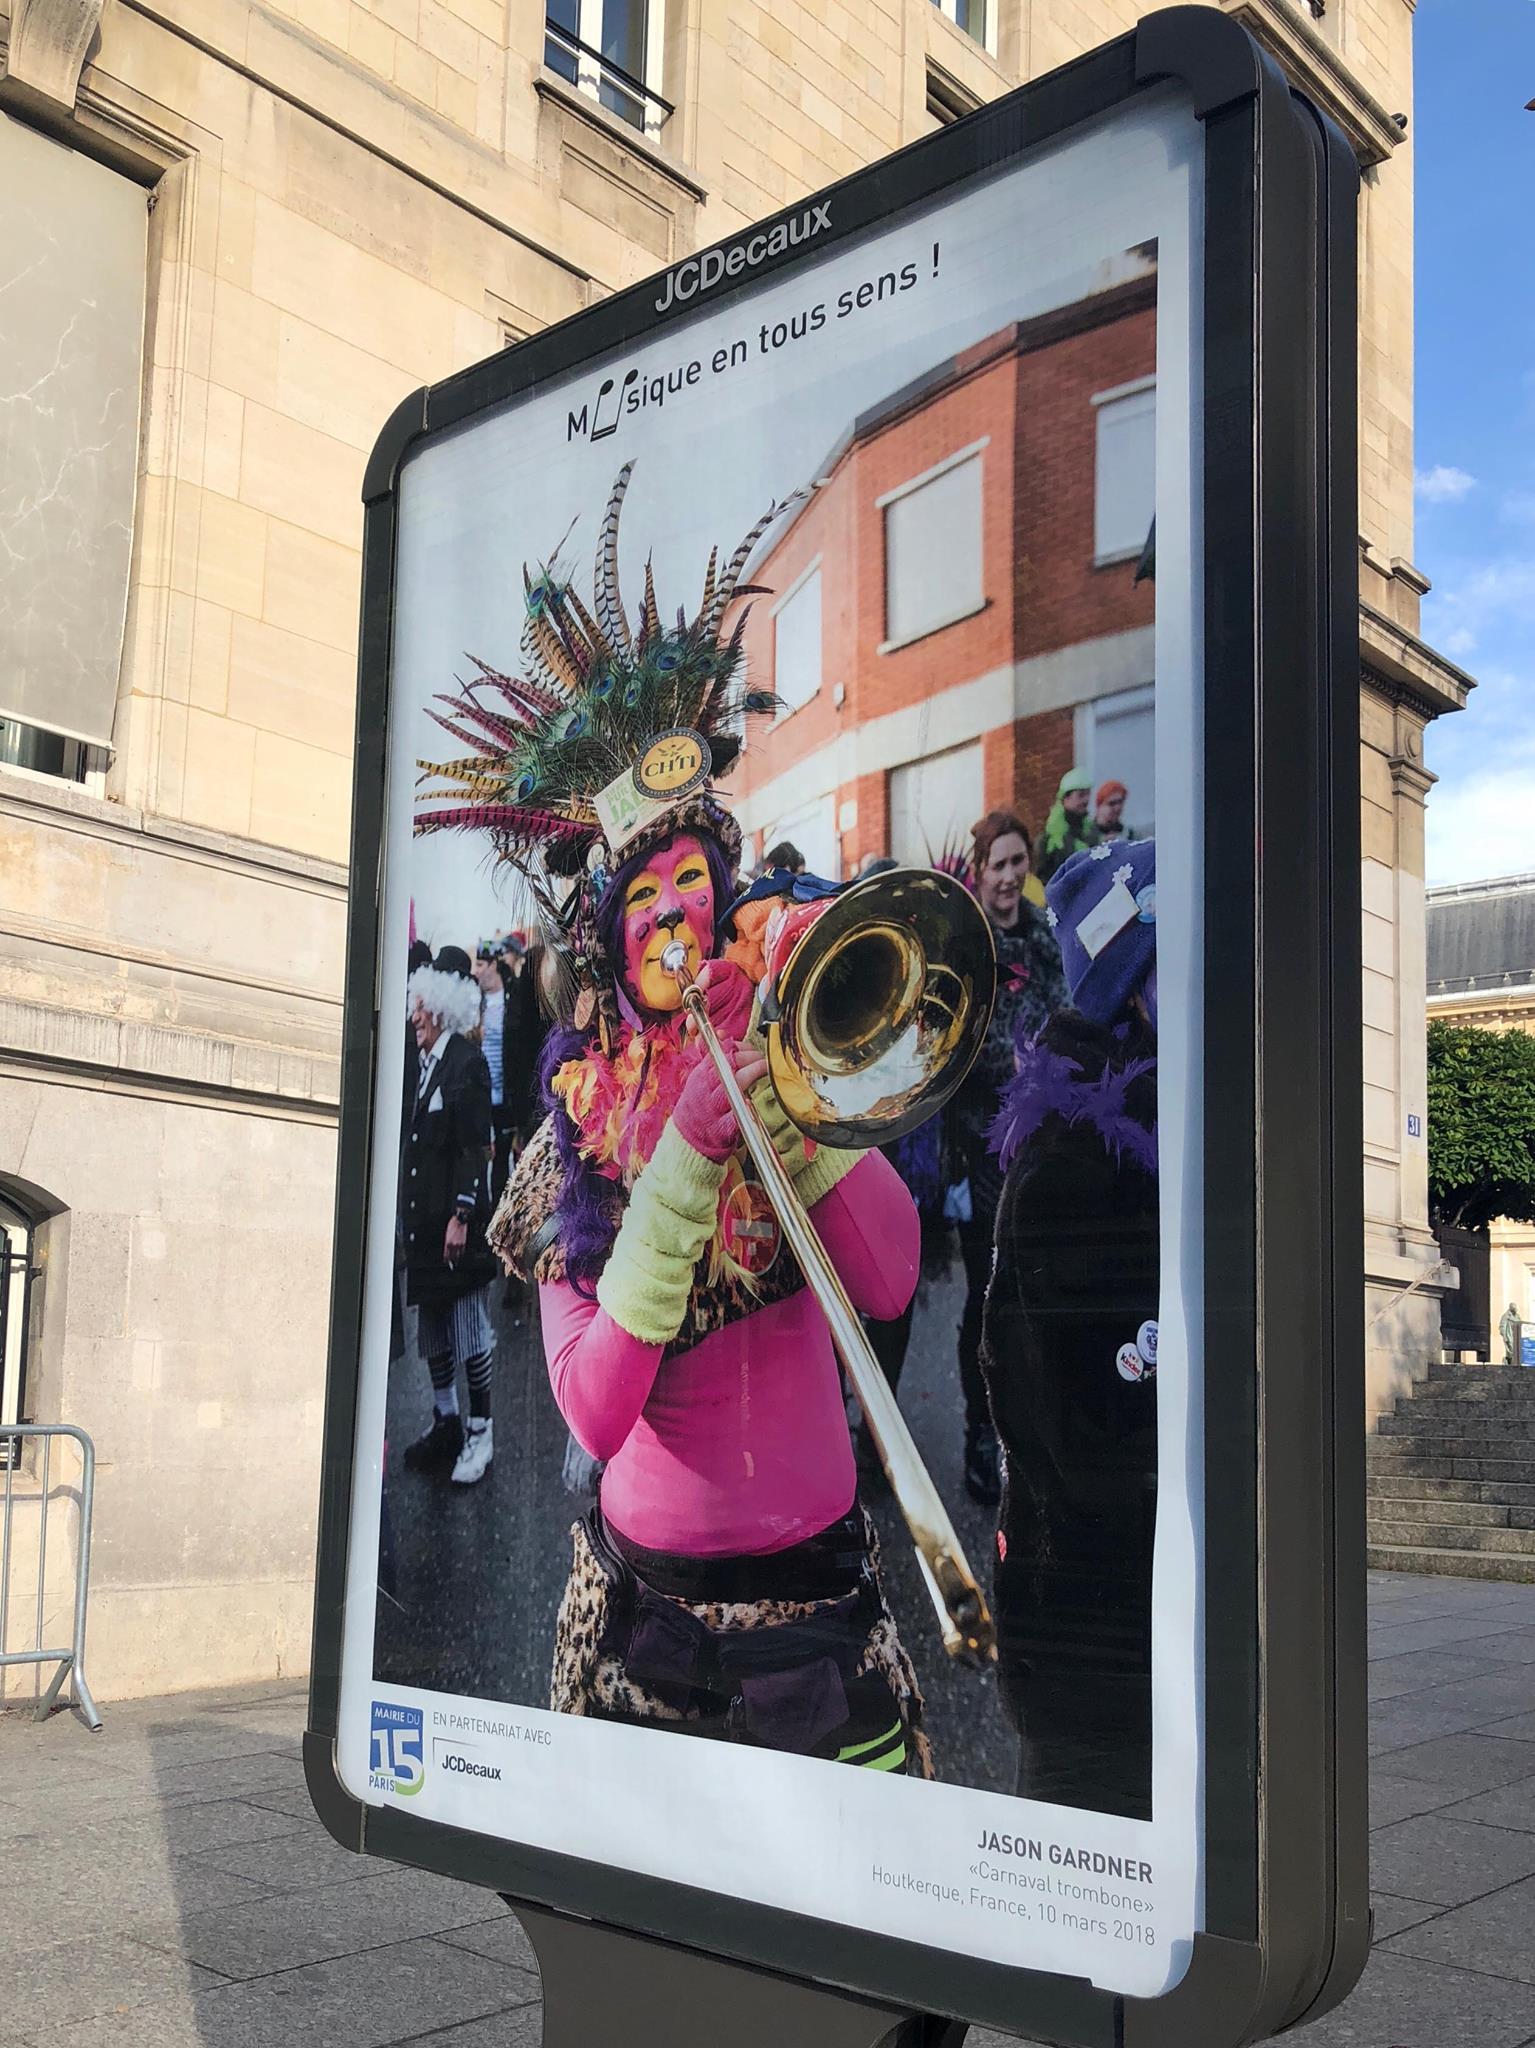 """Carnaval Trombone,"" Houtkerque, France,10 March 2018"